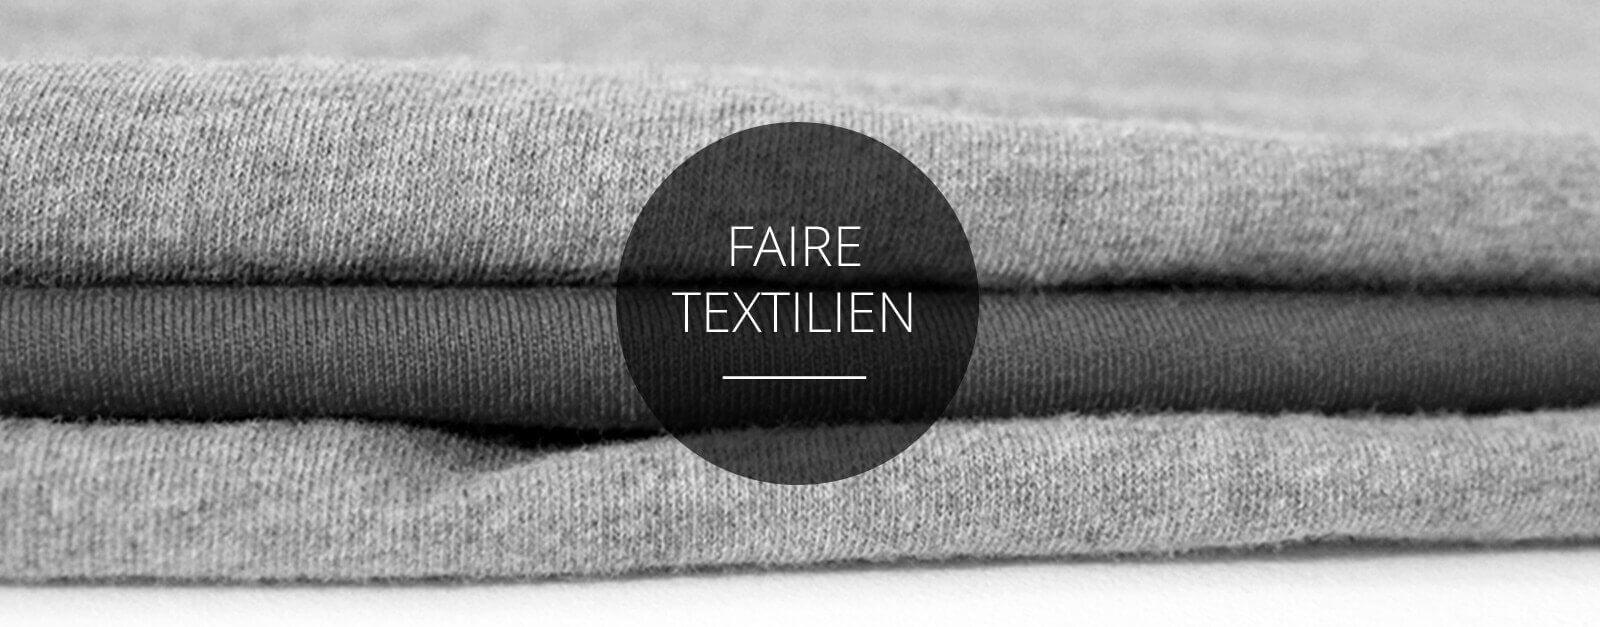 Faire-Textilien-bio-mode-kommabei